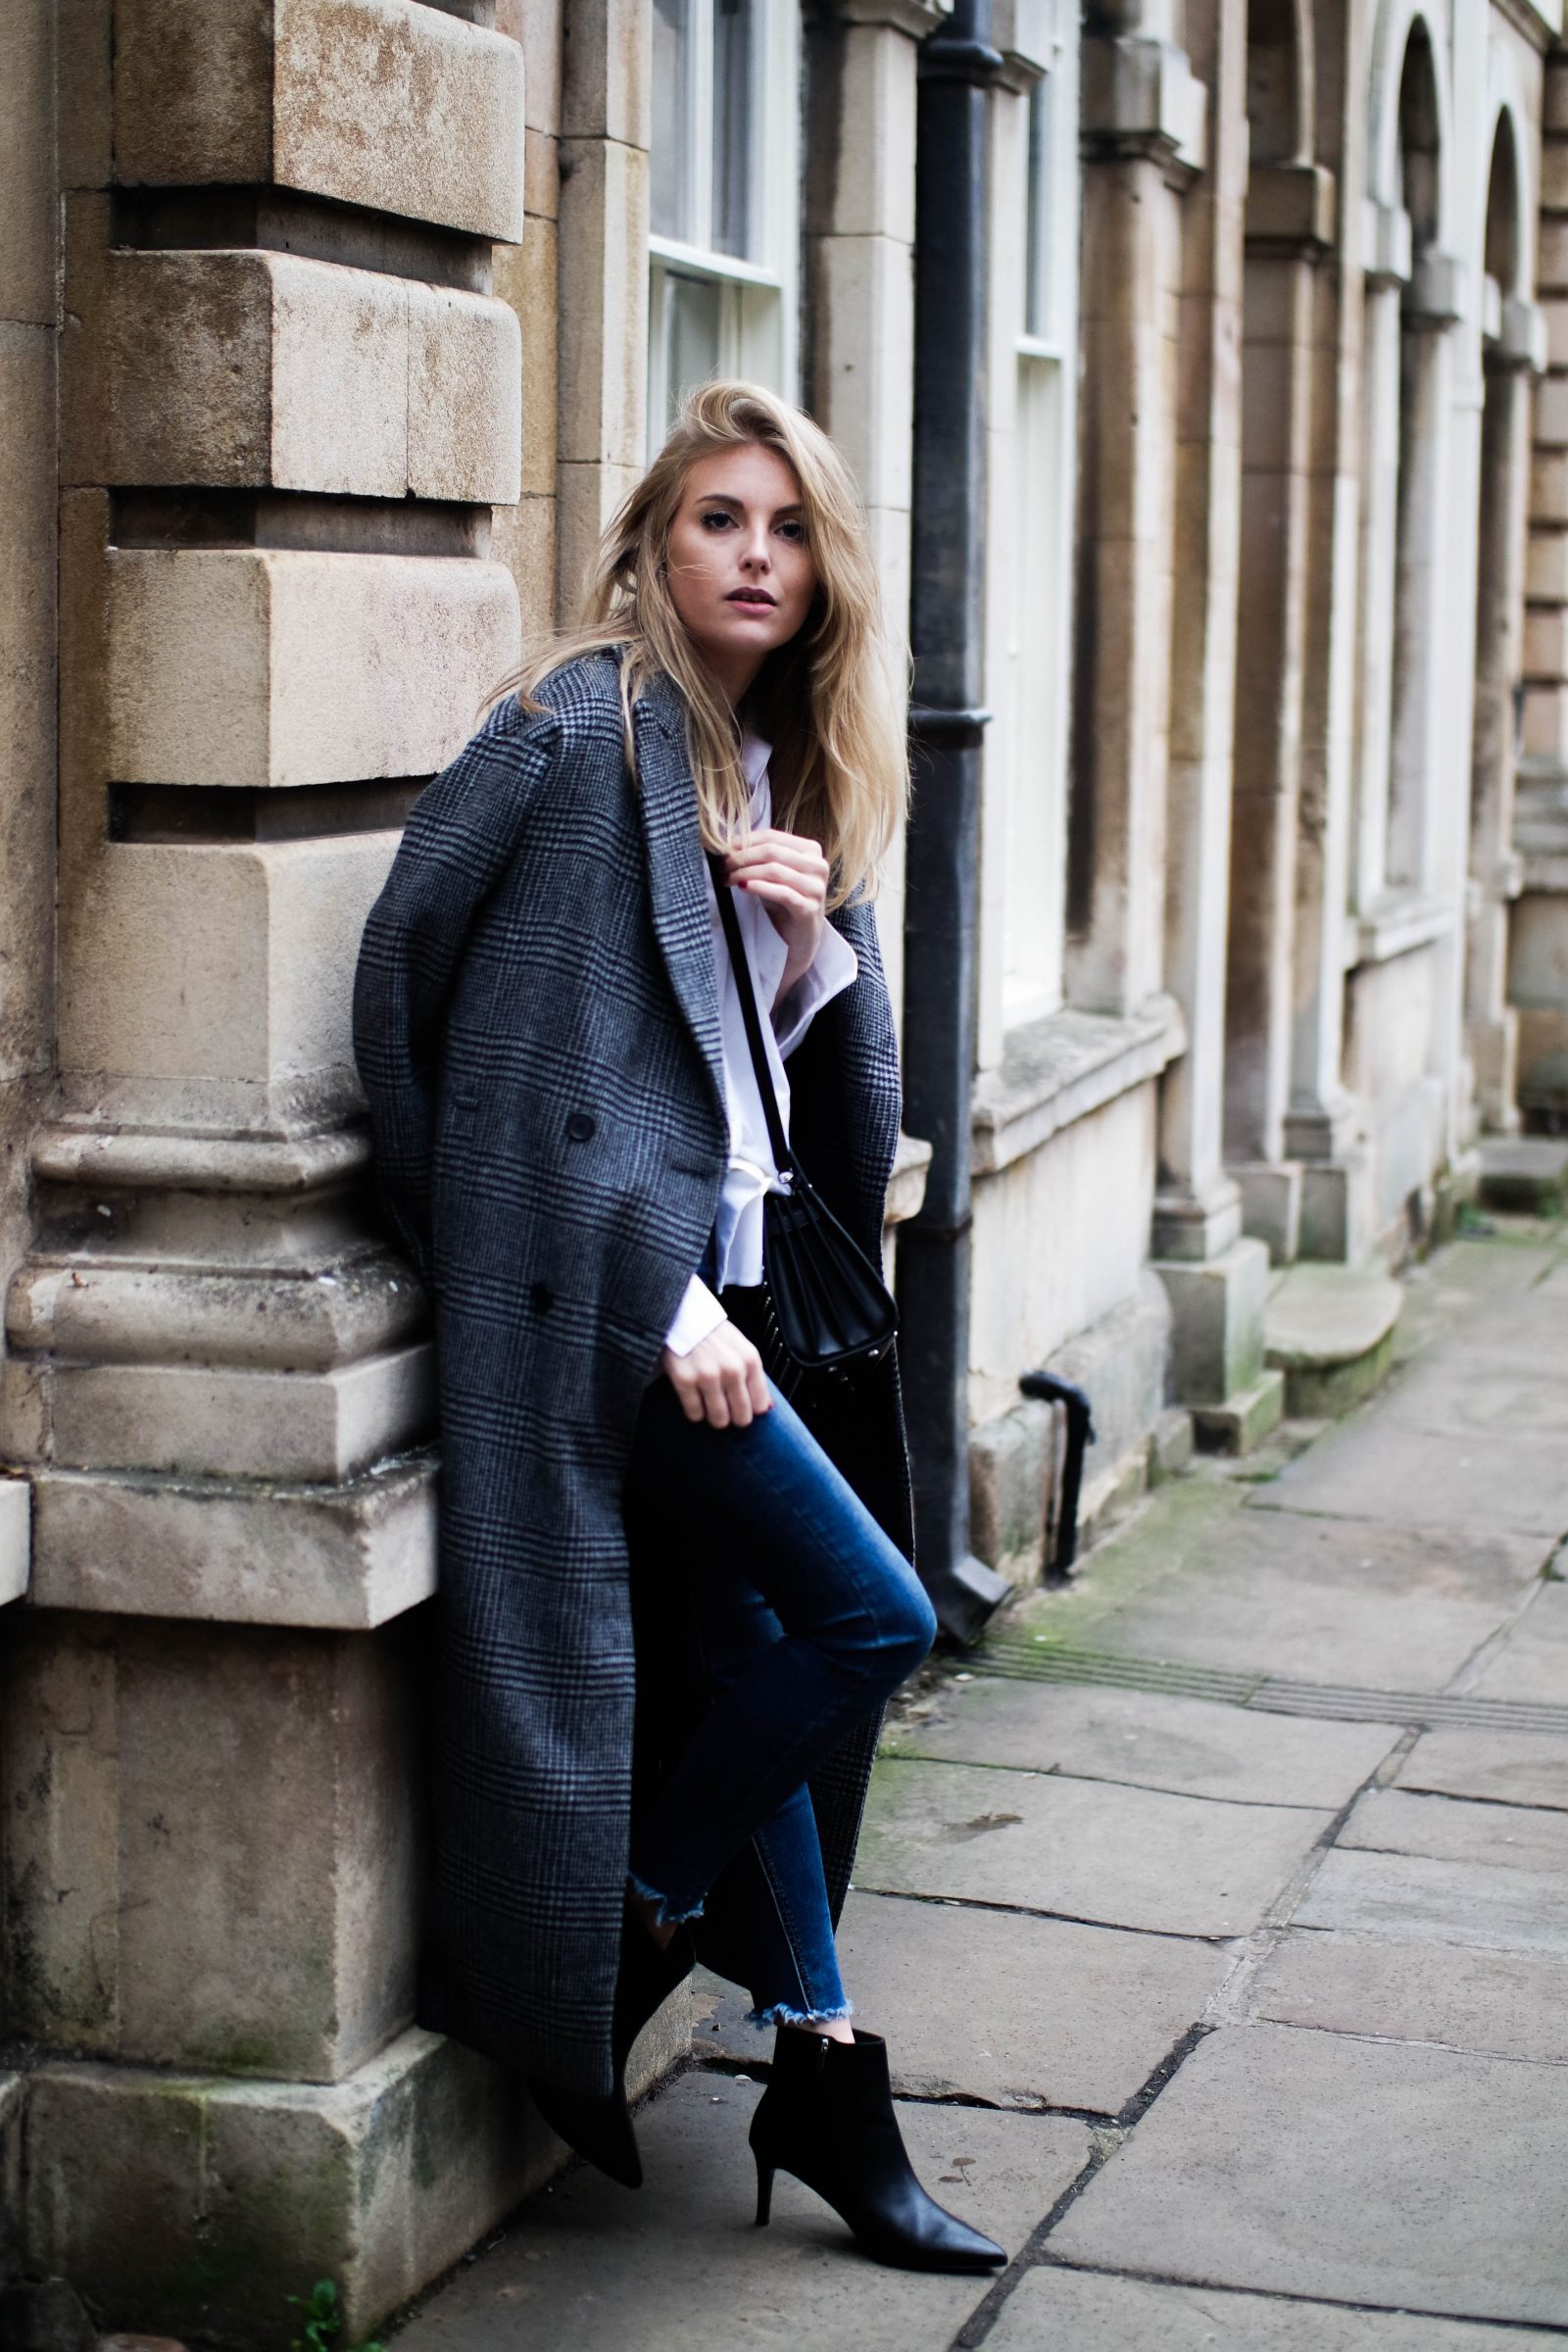 Say Hello To Saint (laurent) - Fashion Blogger Style